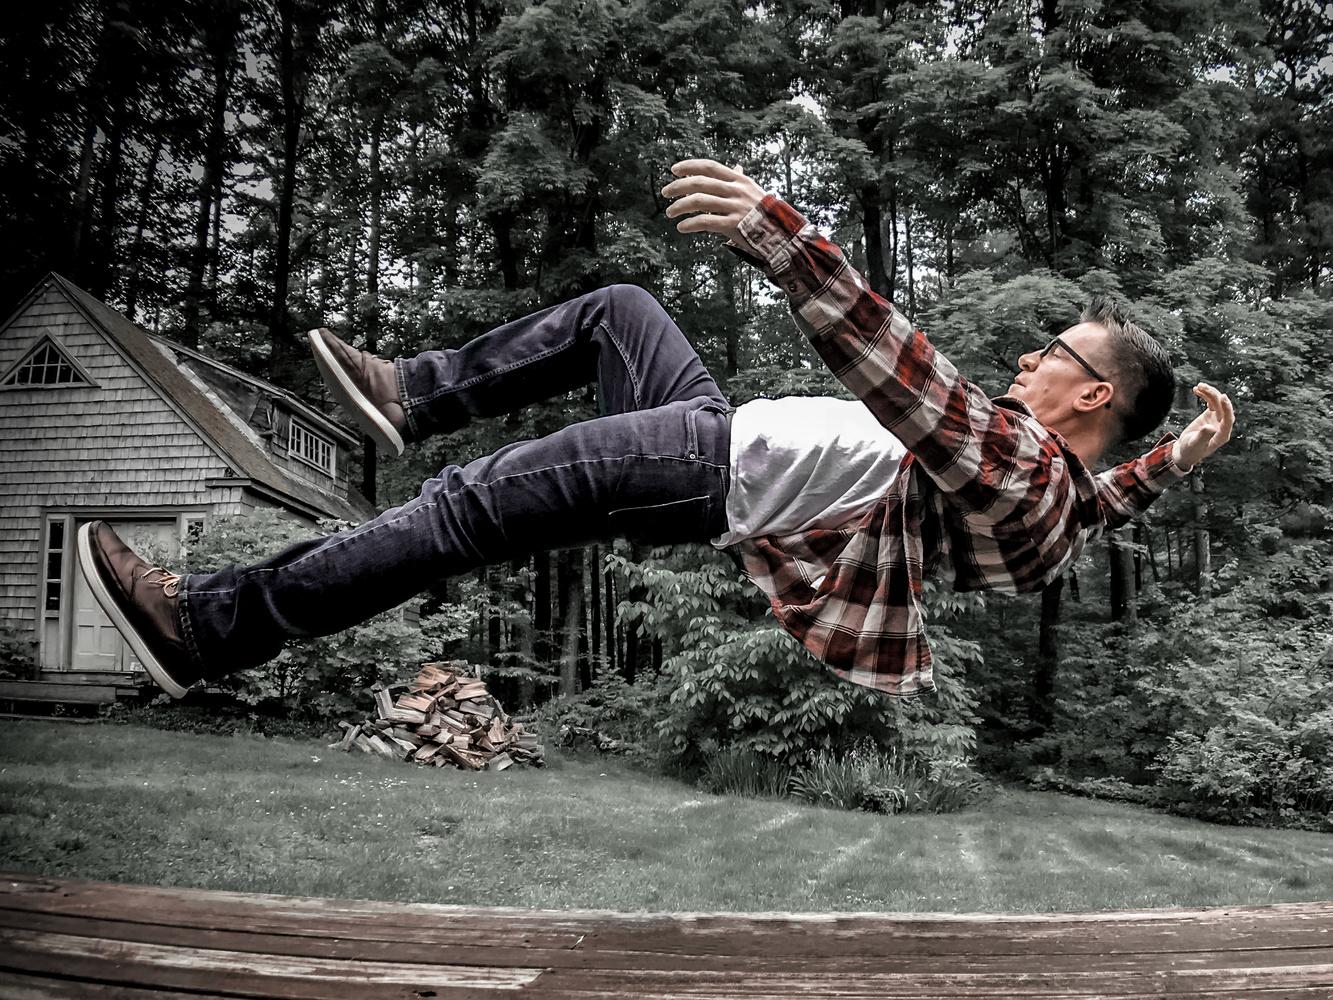 Falling in Slow Motion by Zach Holmes